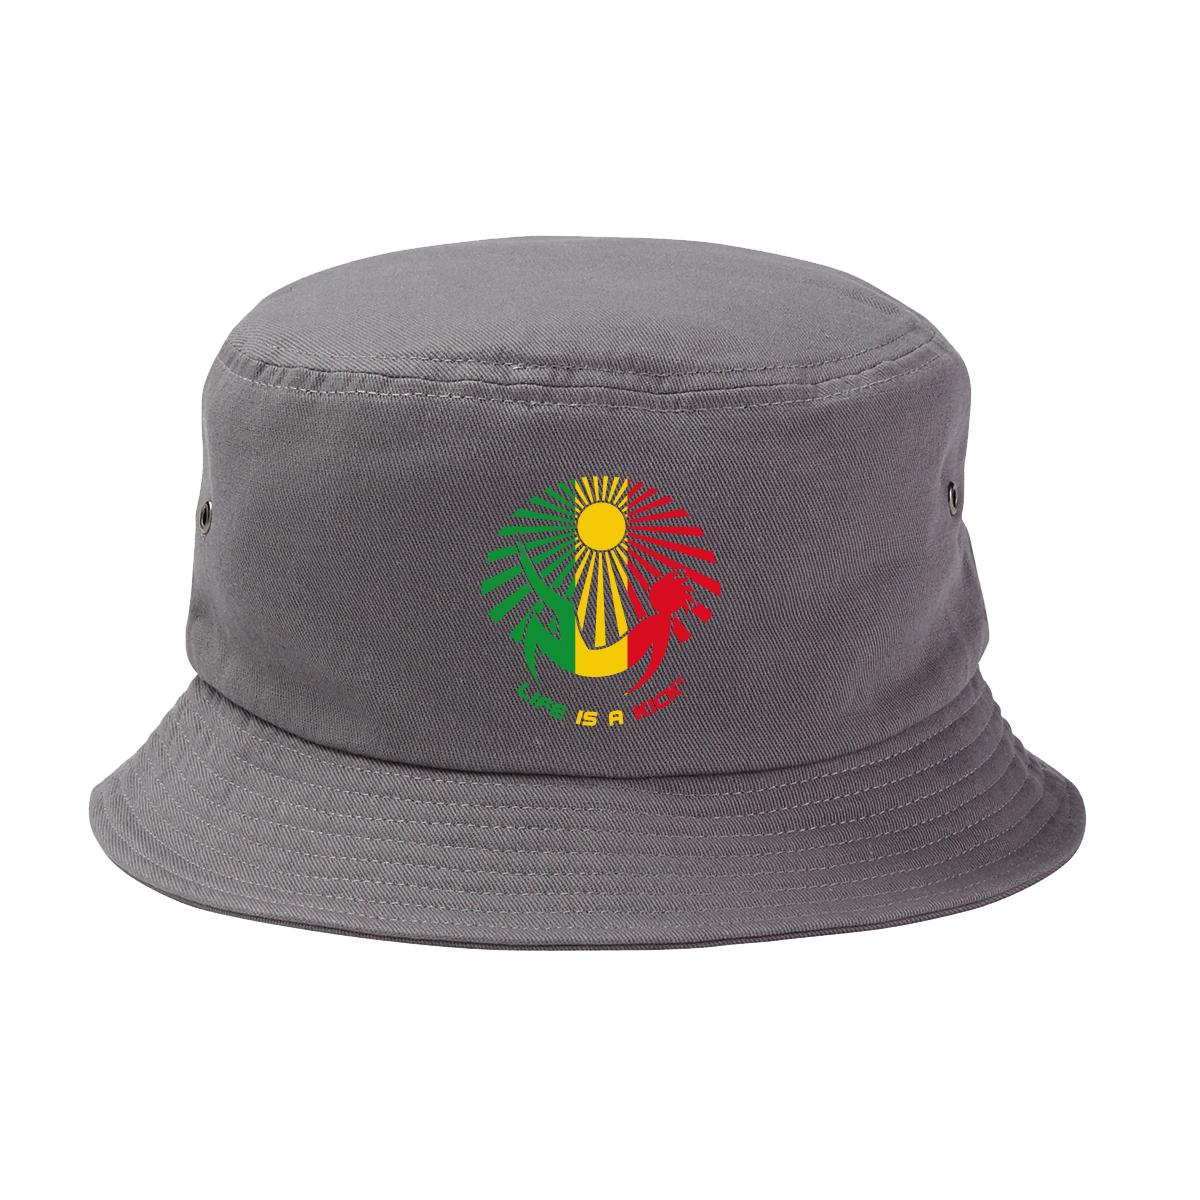 "Rasta"" Bucket Hat – Charcoal « Life is a Kick 615be5a94eb7"